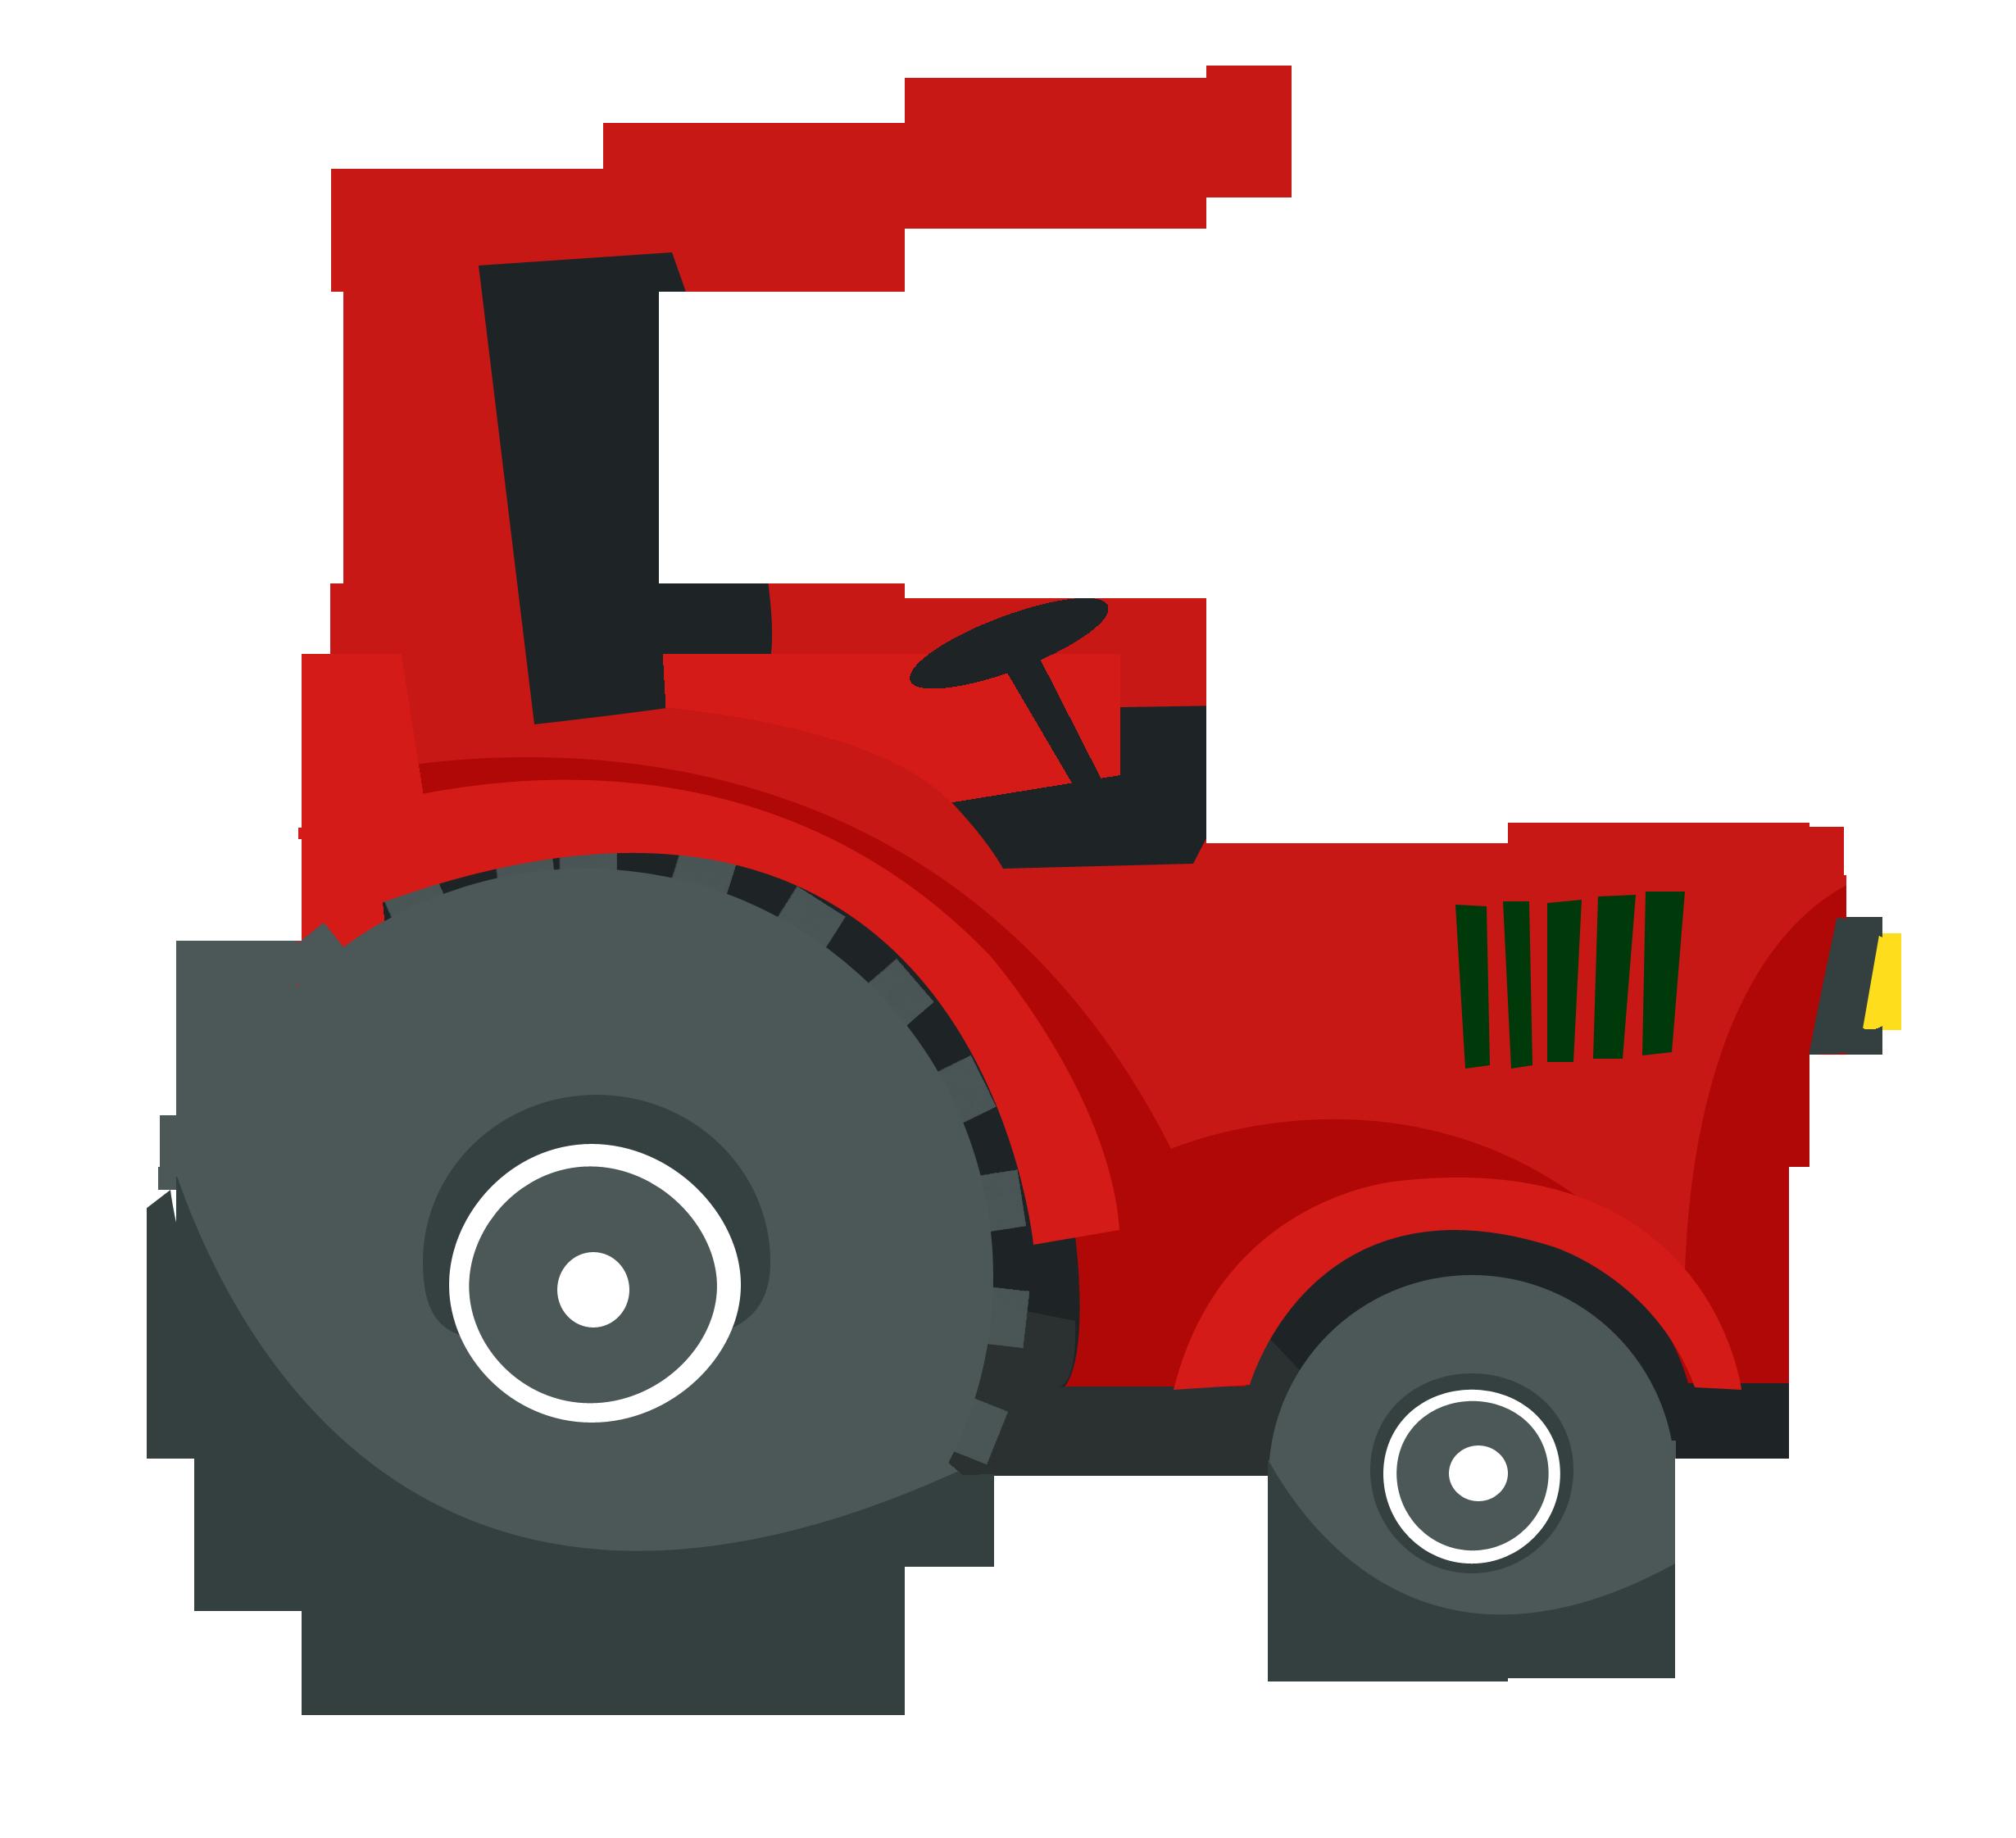 Excavator clipart tractor caterpillar. Fazenda cat on the